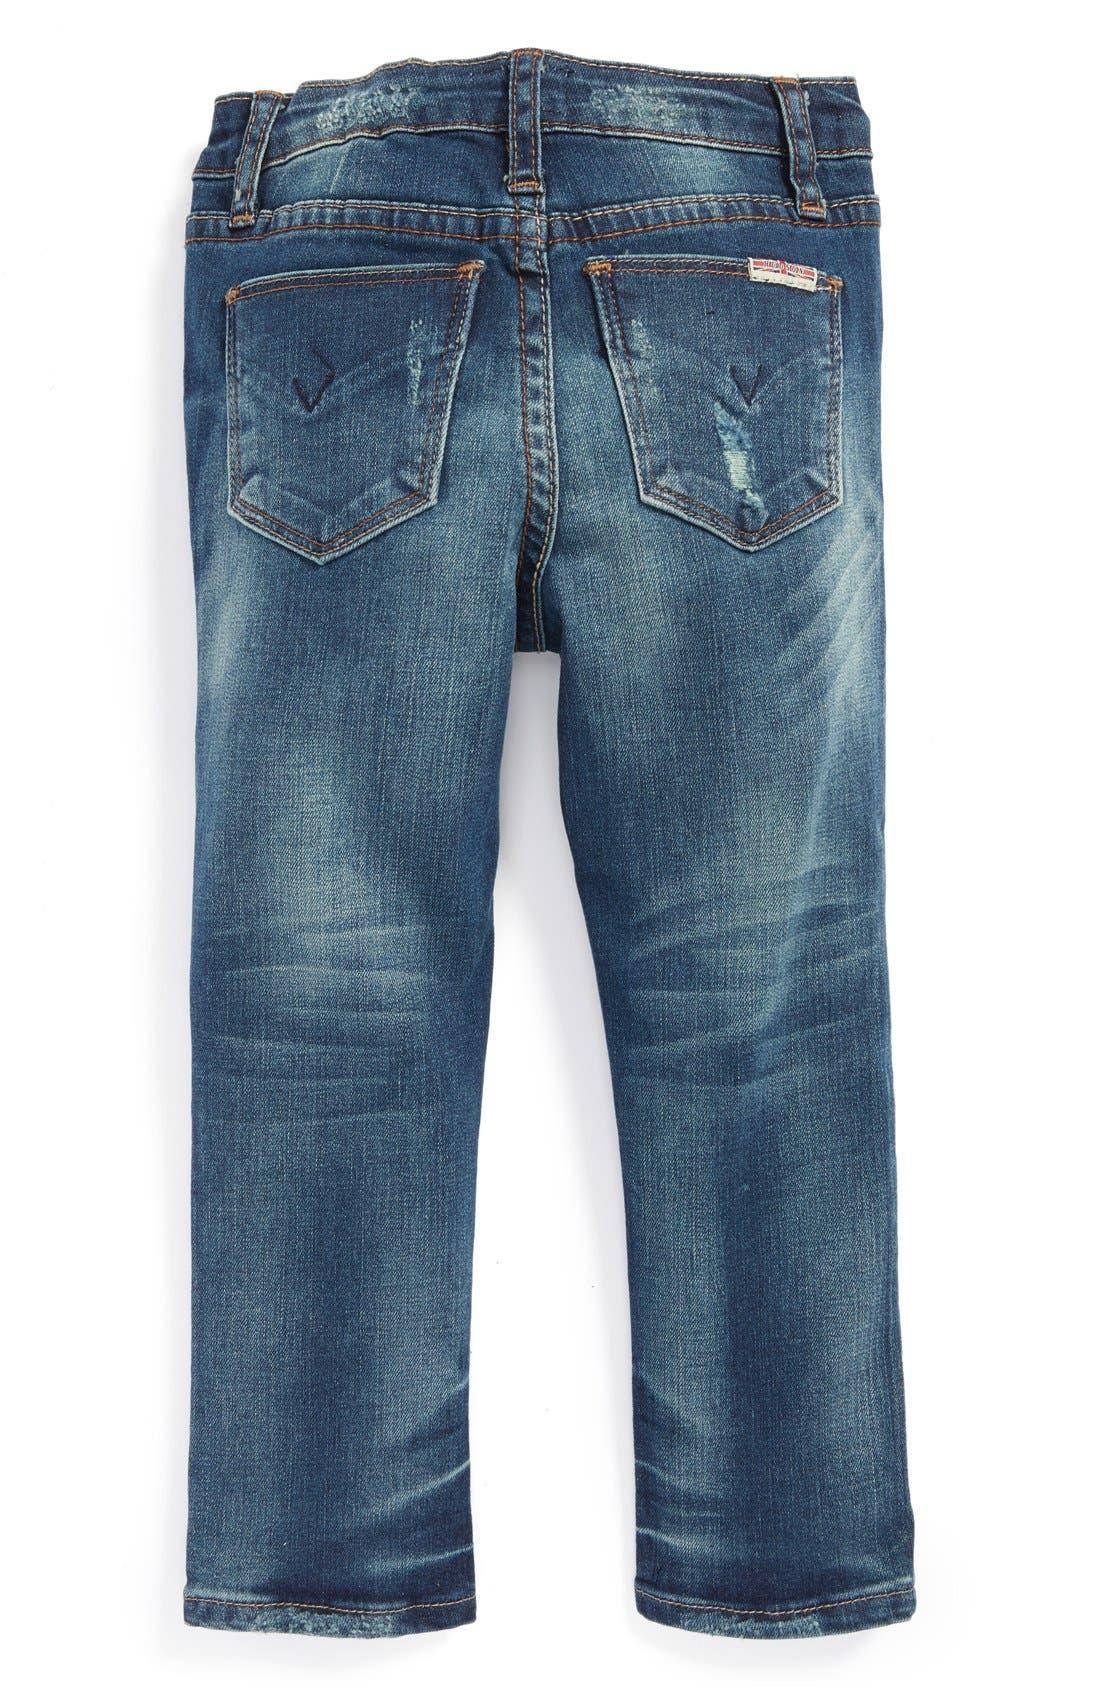 Alternate Image 1 Selected - Hudson Kids 'Dolly' Distressed Skinny Jeans (Toddler Girls)